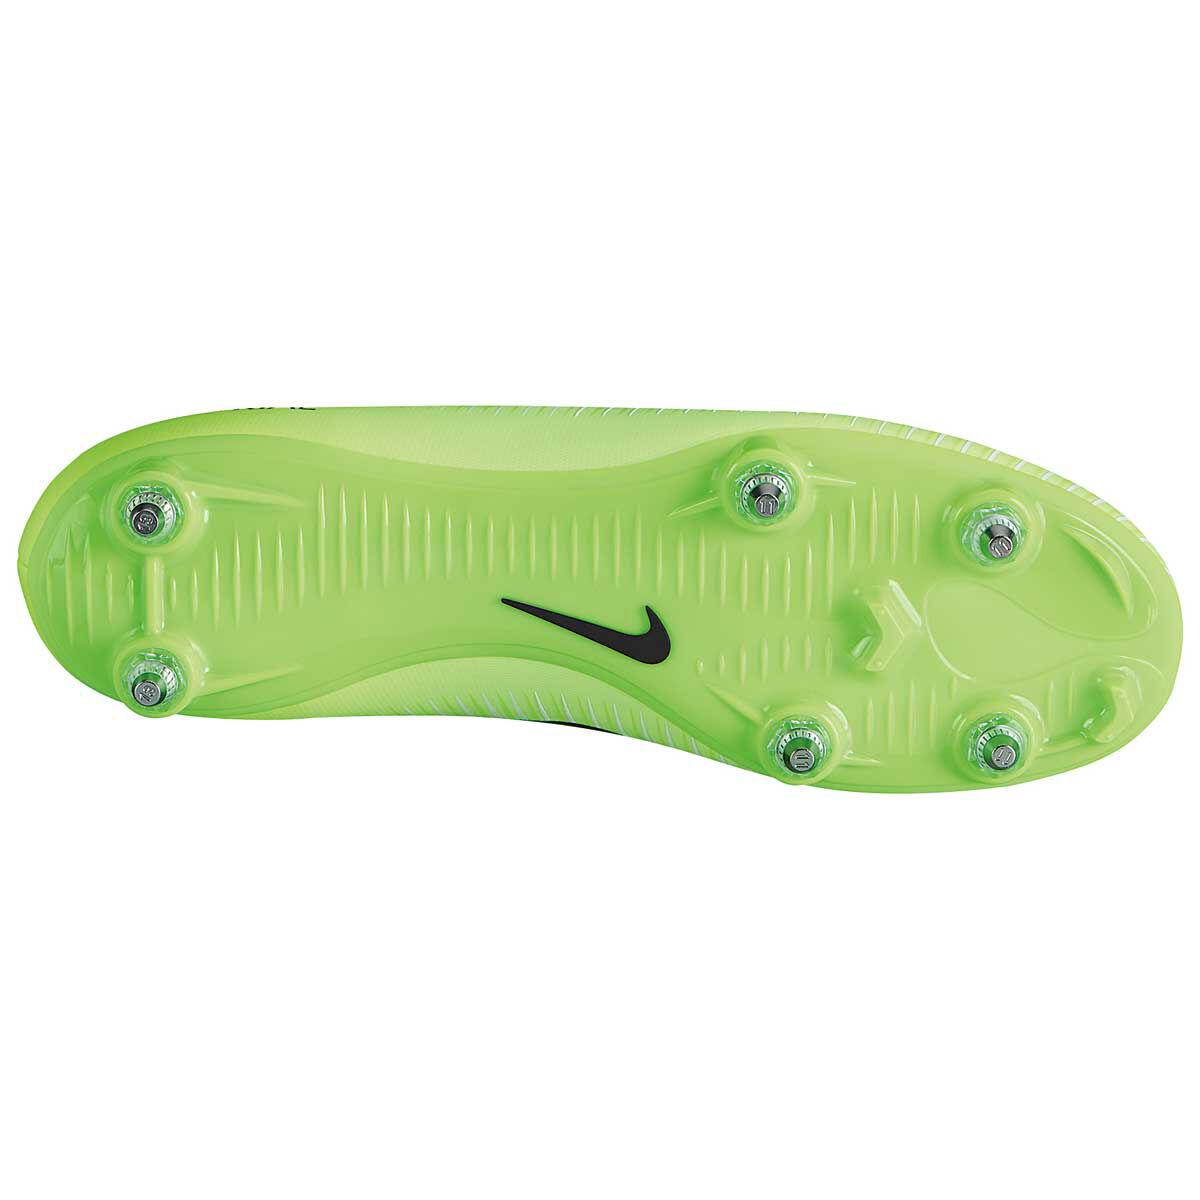 82967f08c75 order nike mercurial victory sg mens football boots green black us 7 adult  green 52508 5af40